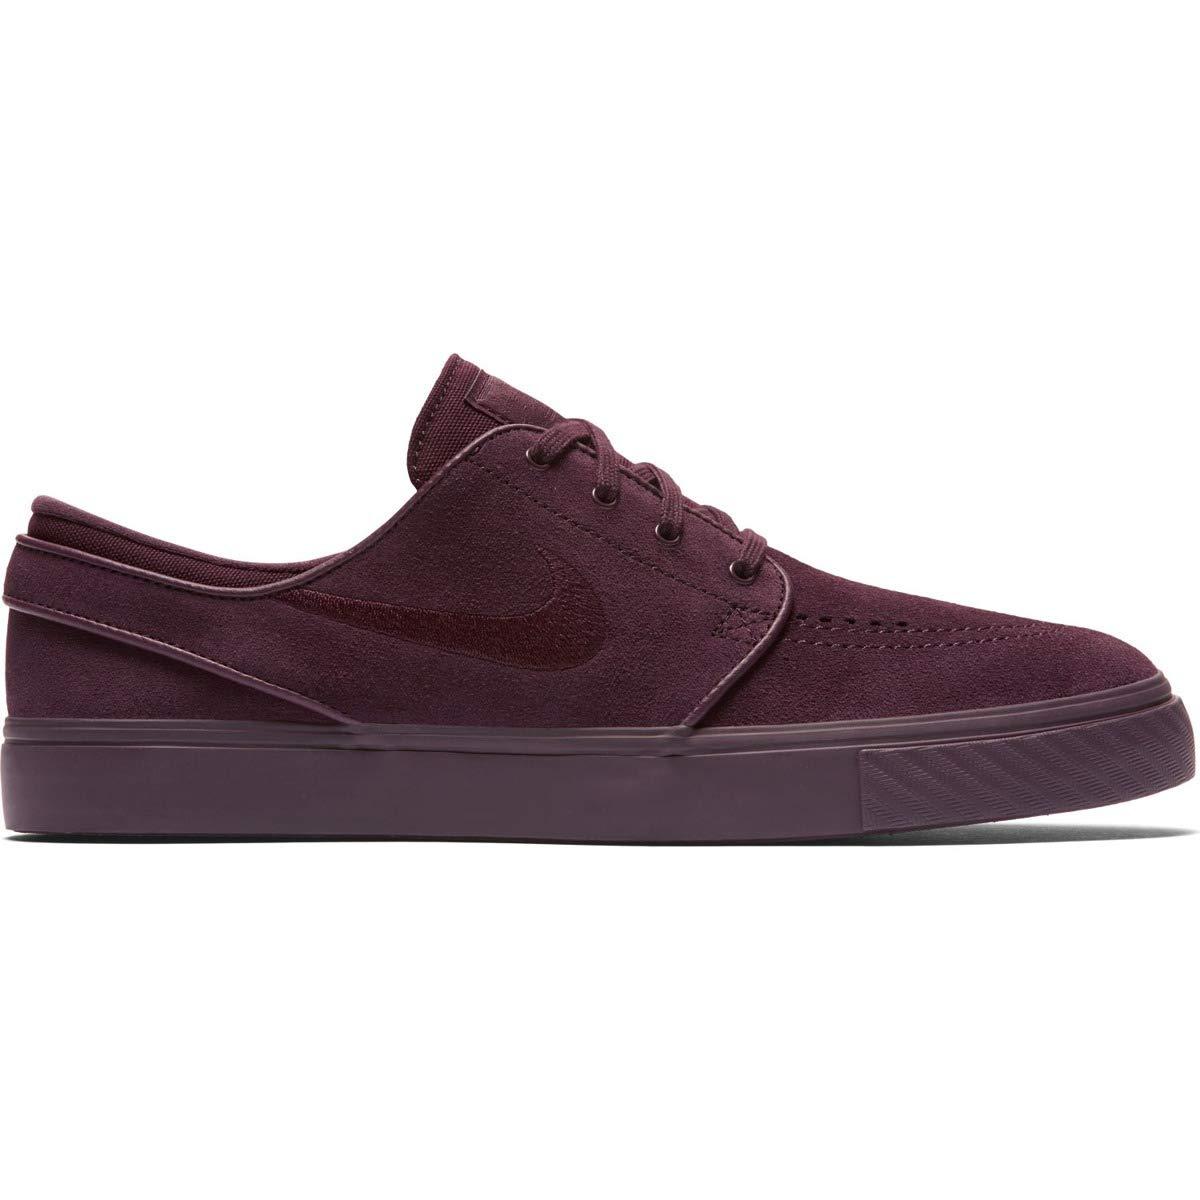 7e0e655c32 Galleon - Nike Men's Zoom Stefan Janoski Skate Shoe (13 D(M) US, Burgundy  Crush/Burgundy Crush)